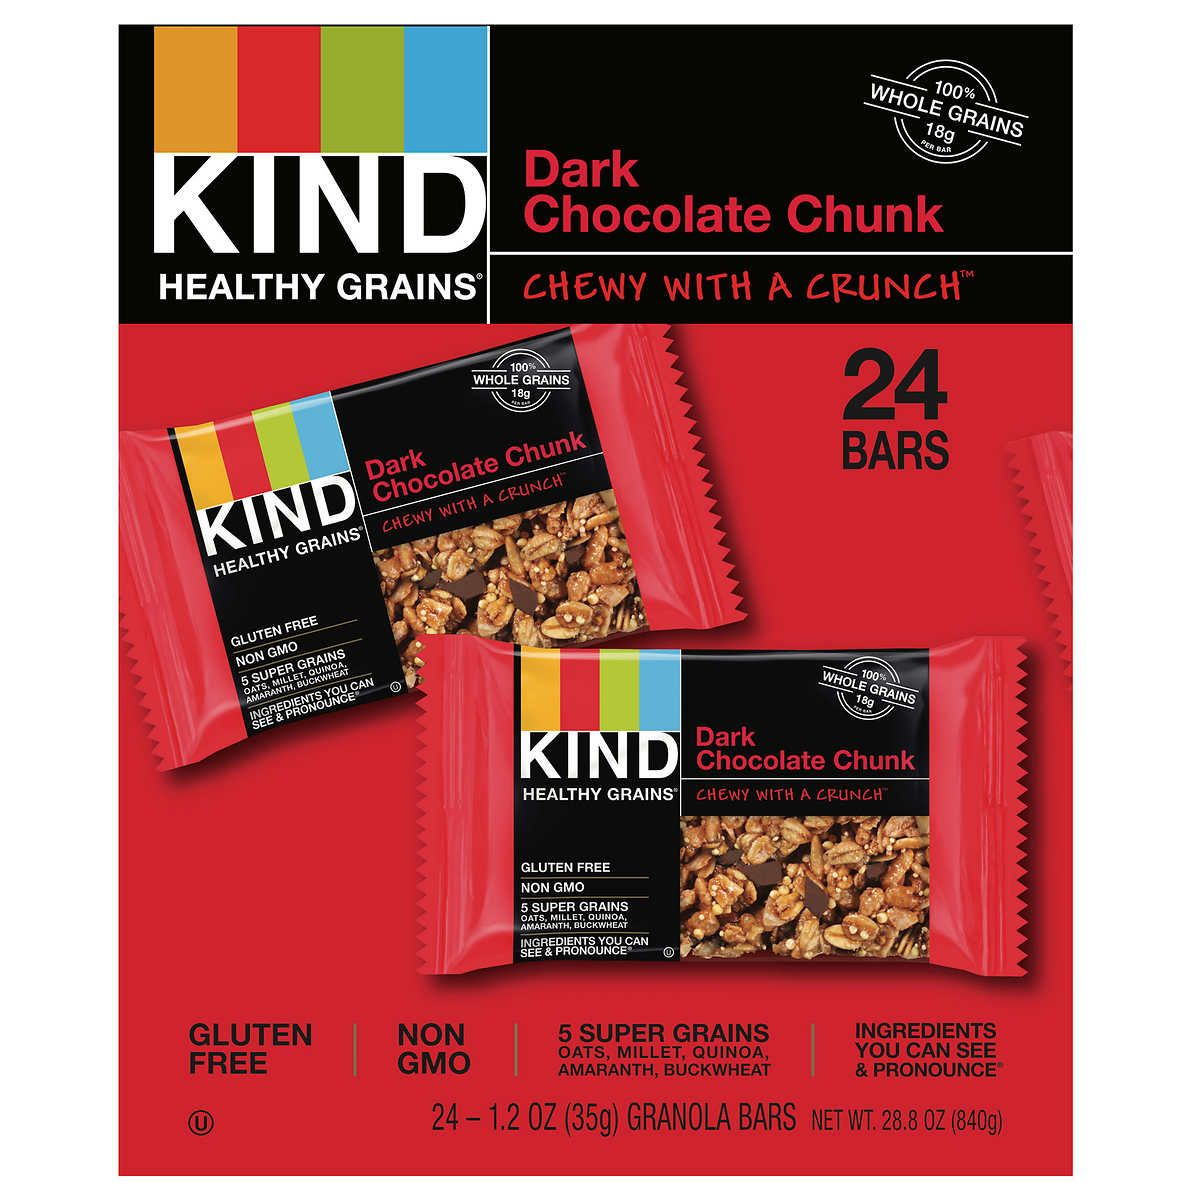 Kind Healthy Grains Dark Chocolate Chunk 12 Oz 24 Count